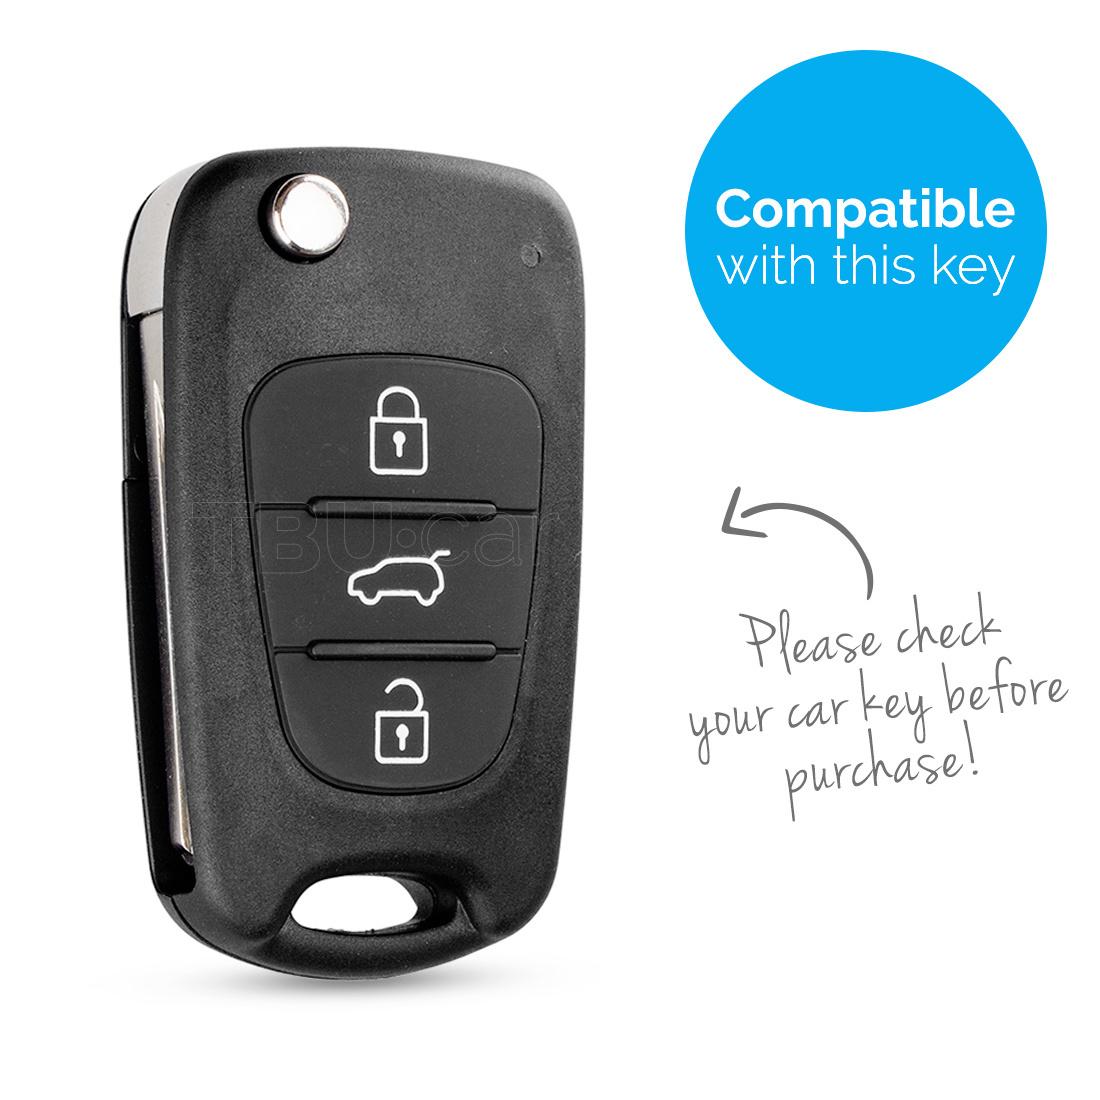 TBU car TBU car Sleutel cover compatibel met Hyundai - Silicone sleutelhoesje - beschermhoesje autosleutel - Paars